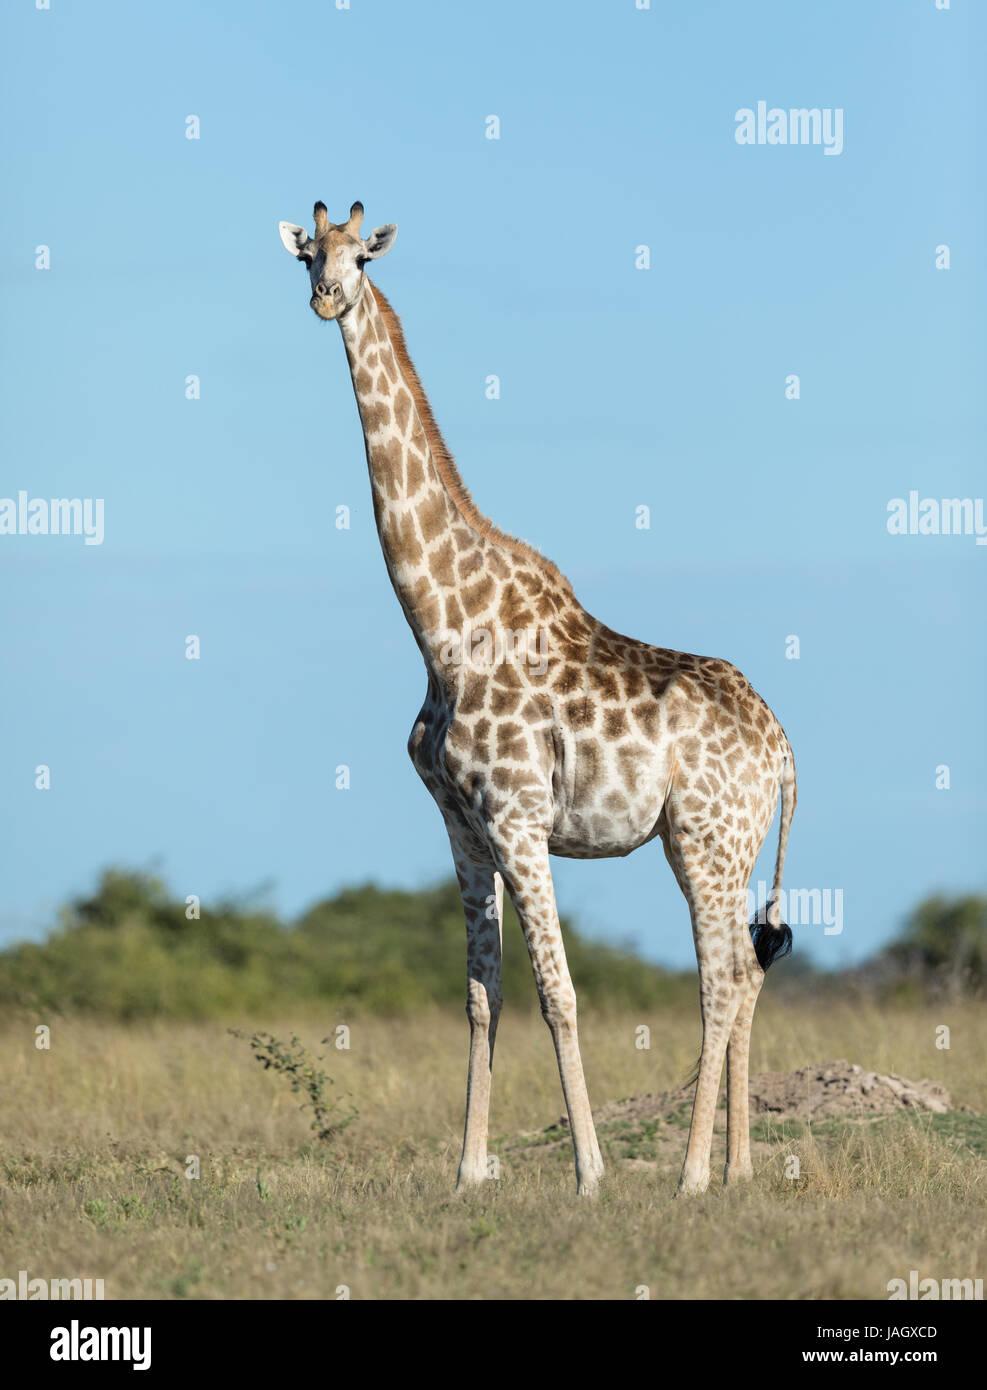 Female Southern Giraffe in the Savuti area of Chobe National Park in Botswana - Stock Image